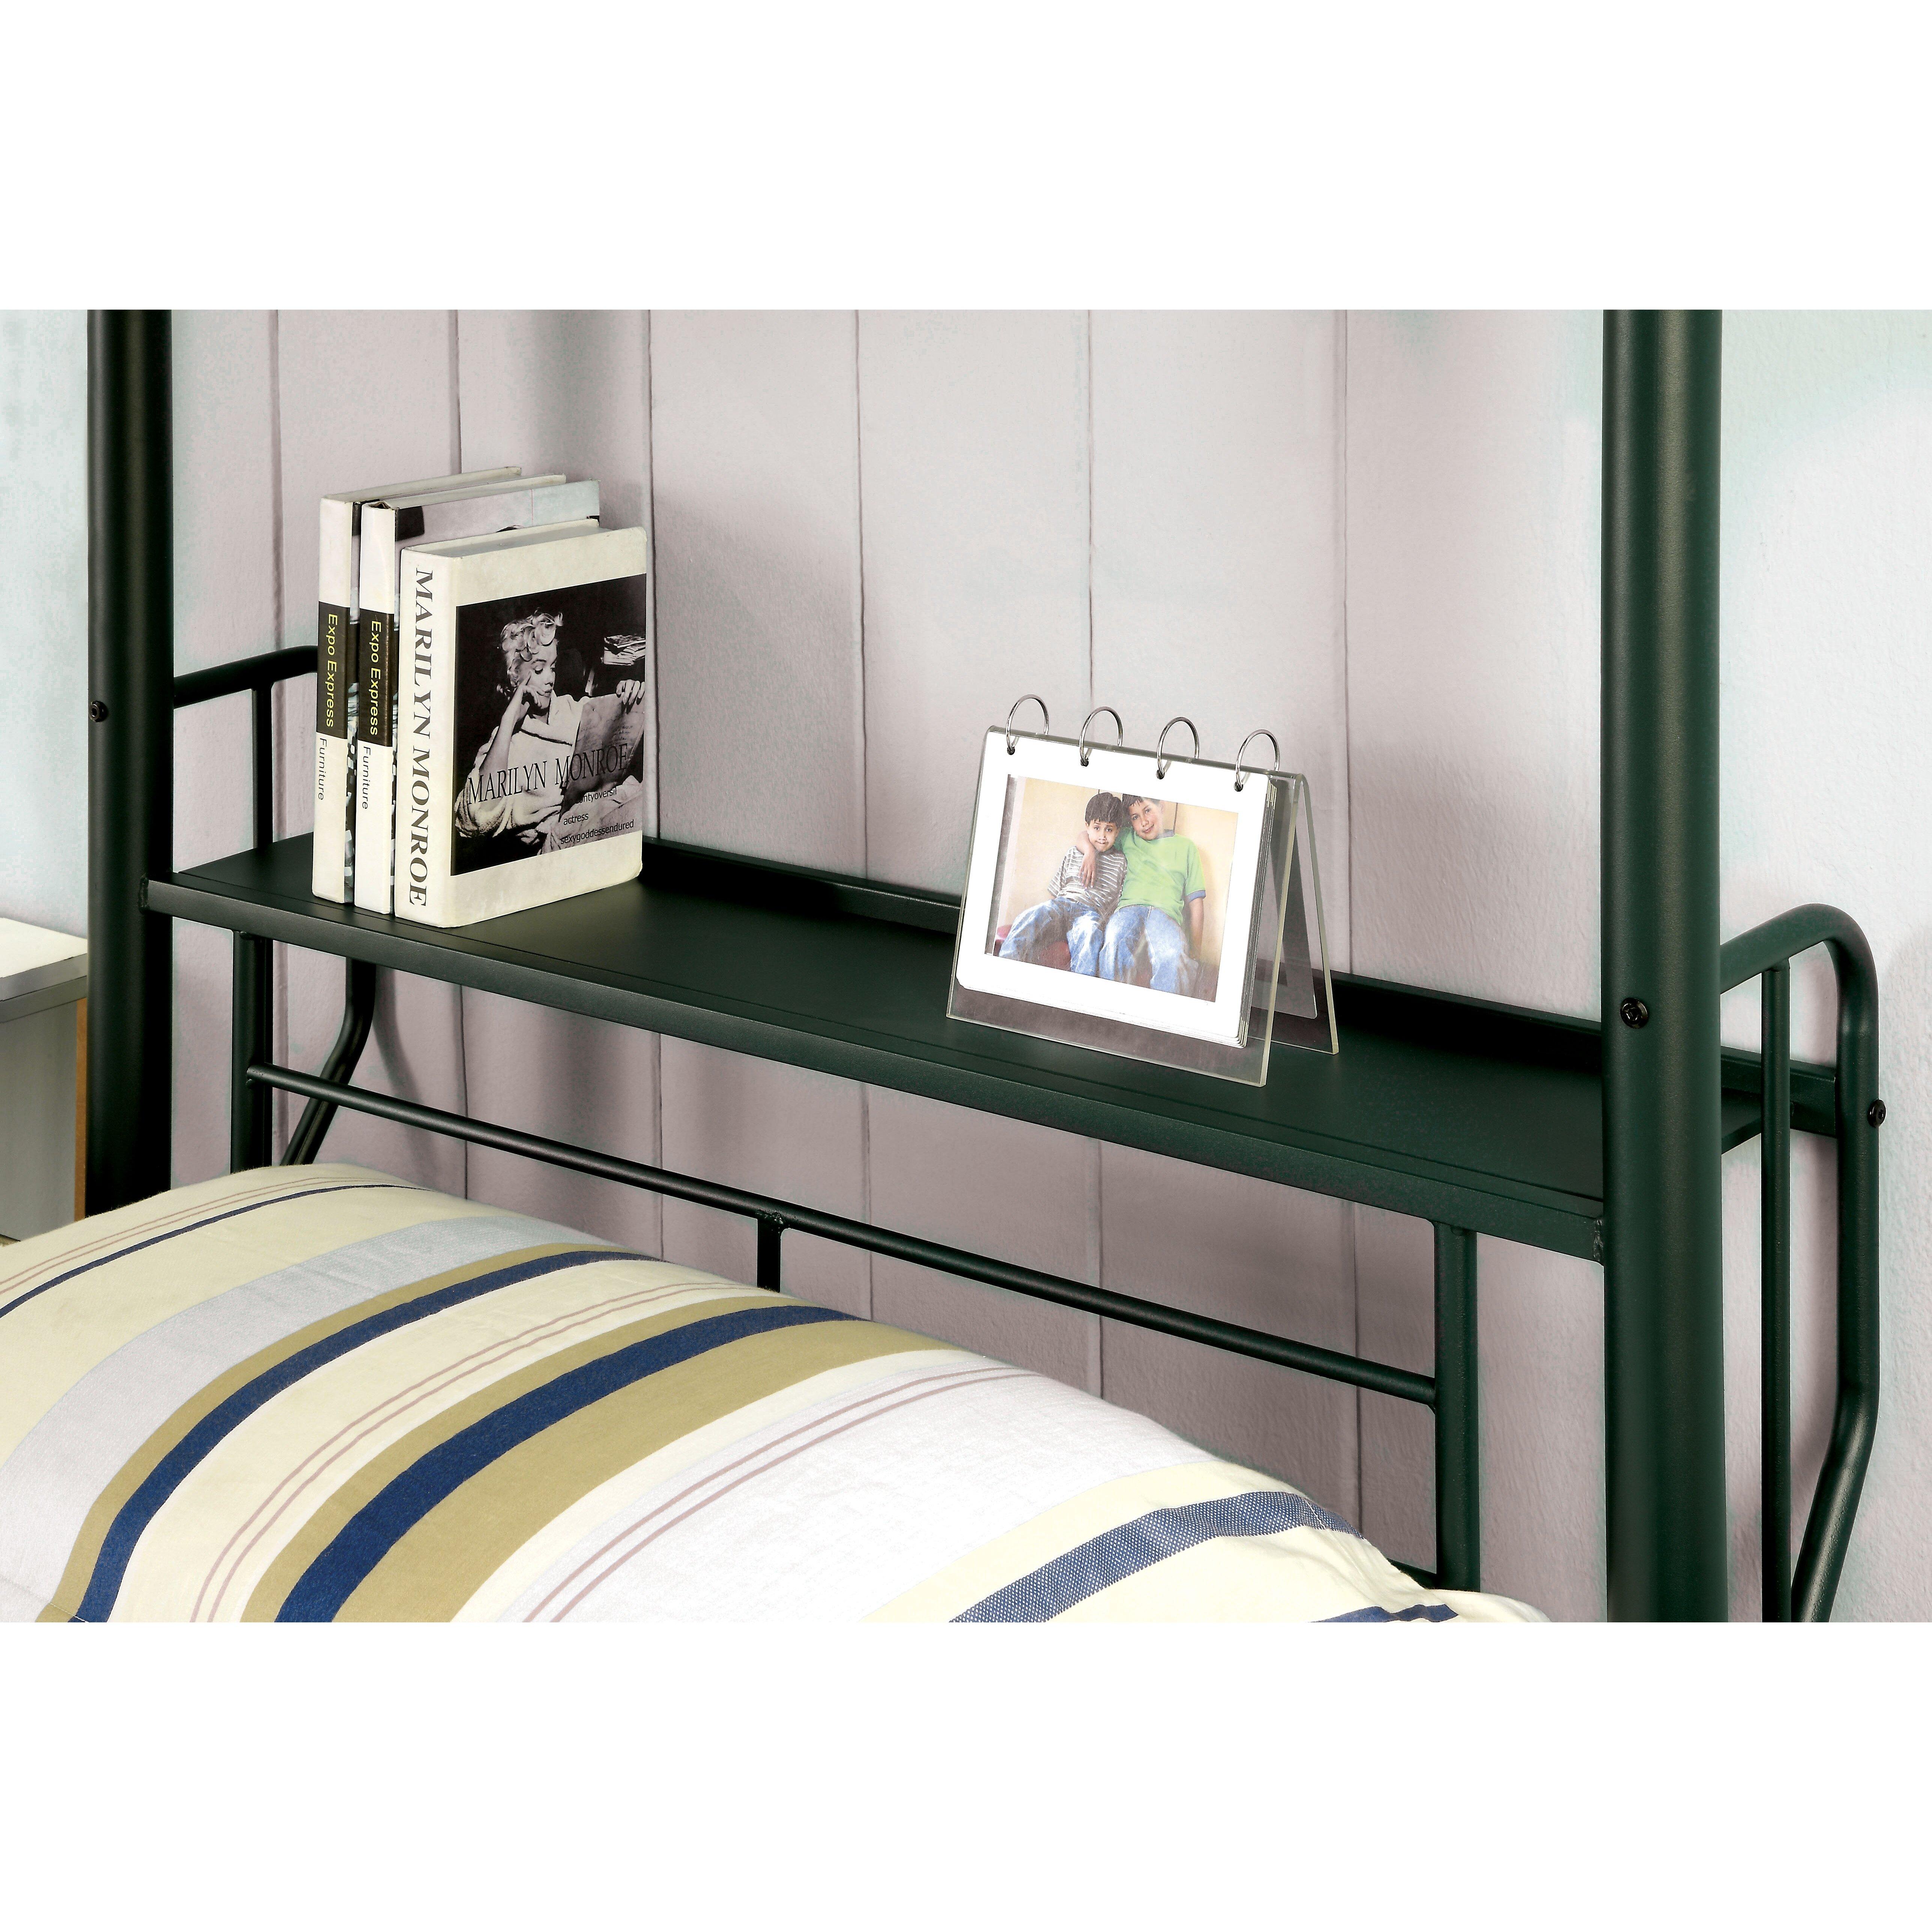 Hokku Designs Bunk Beds